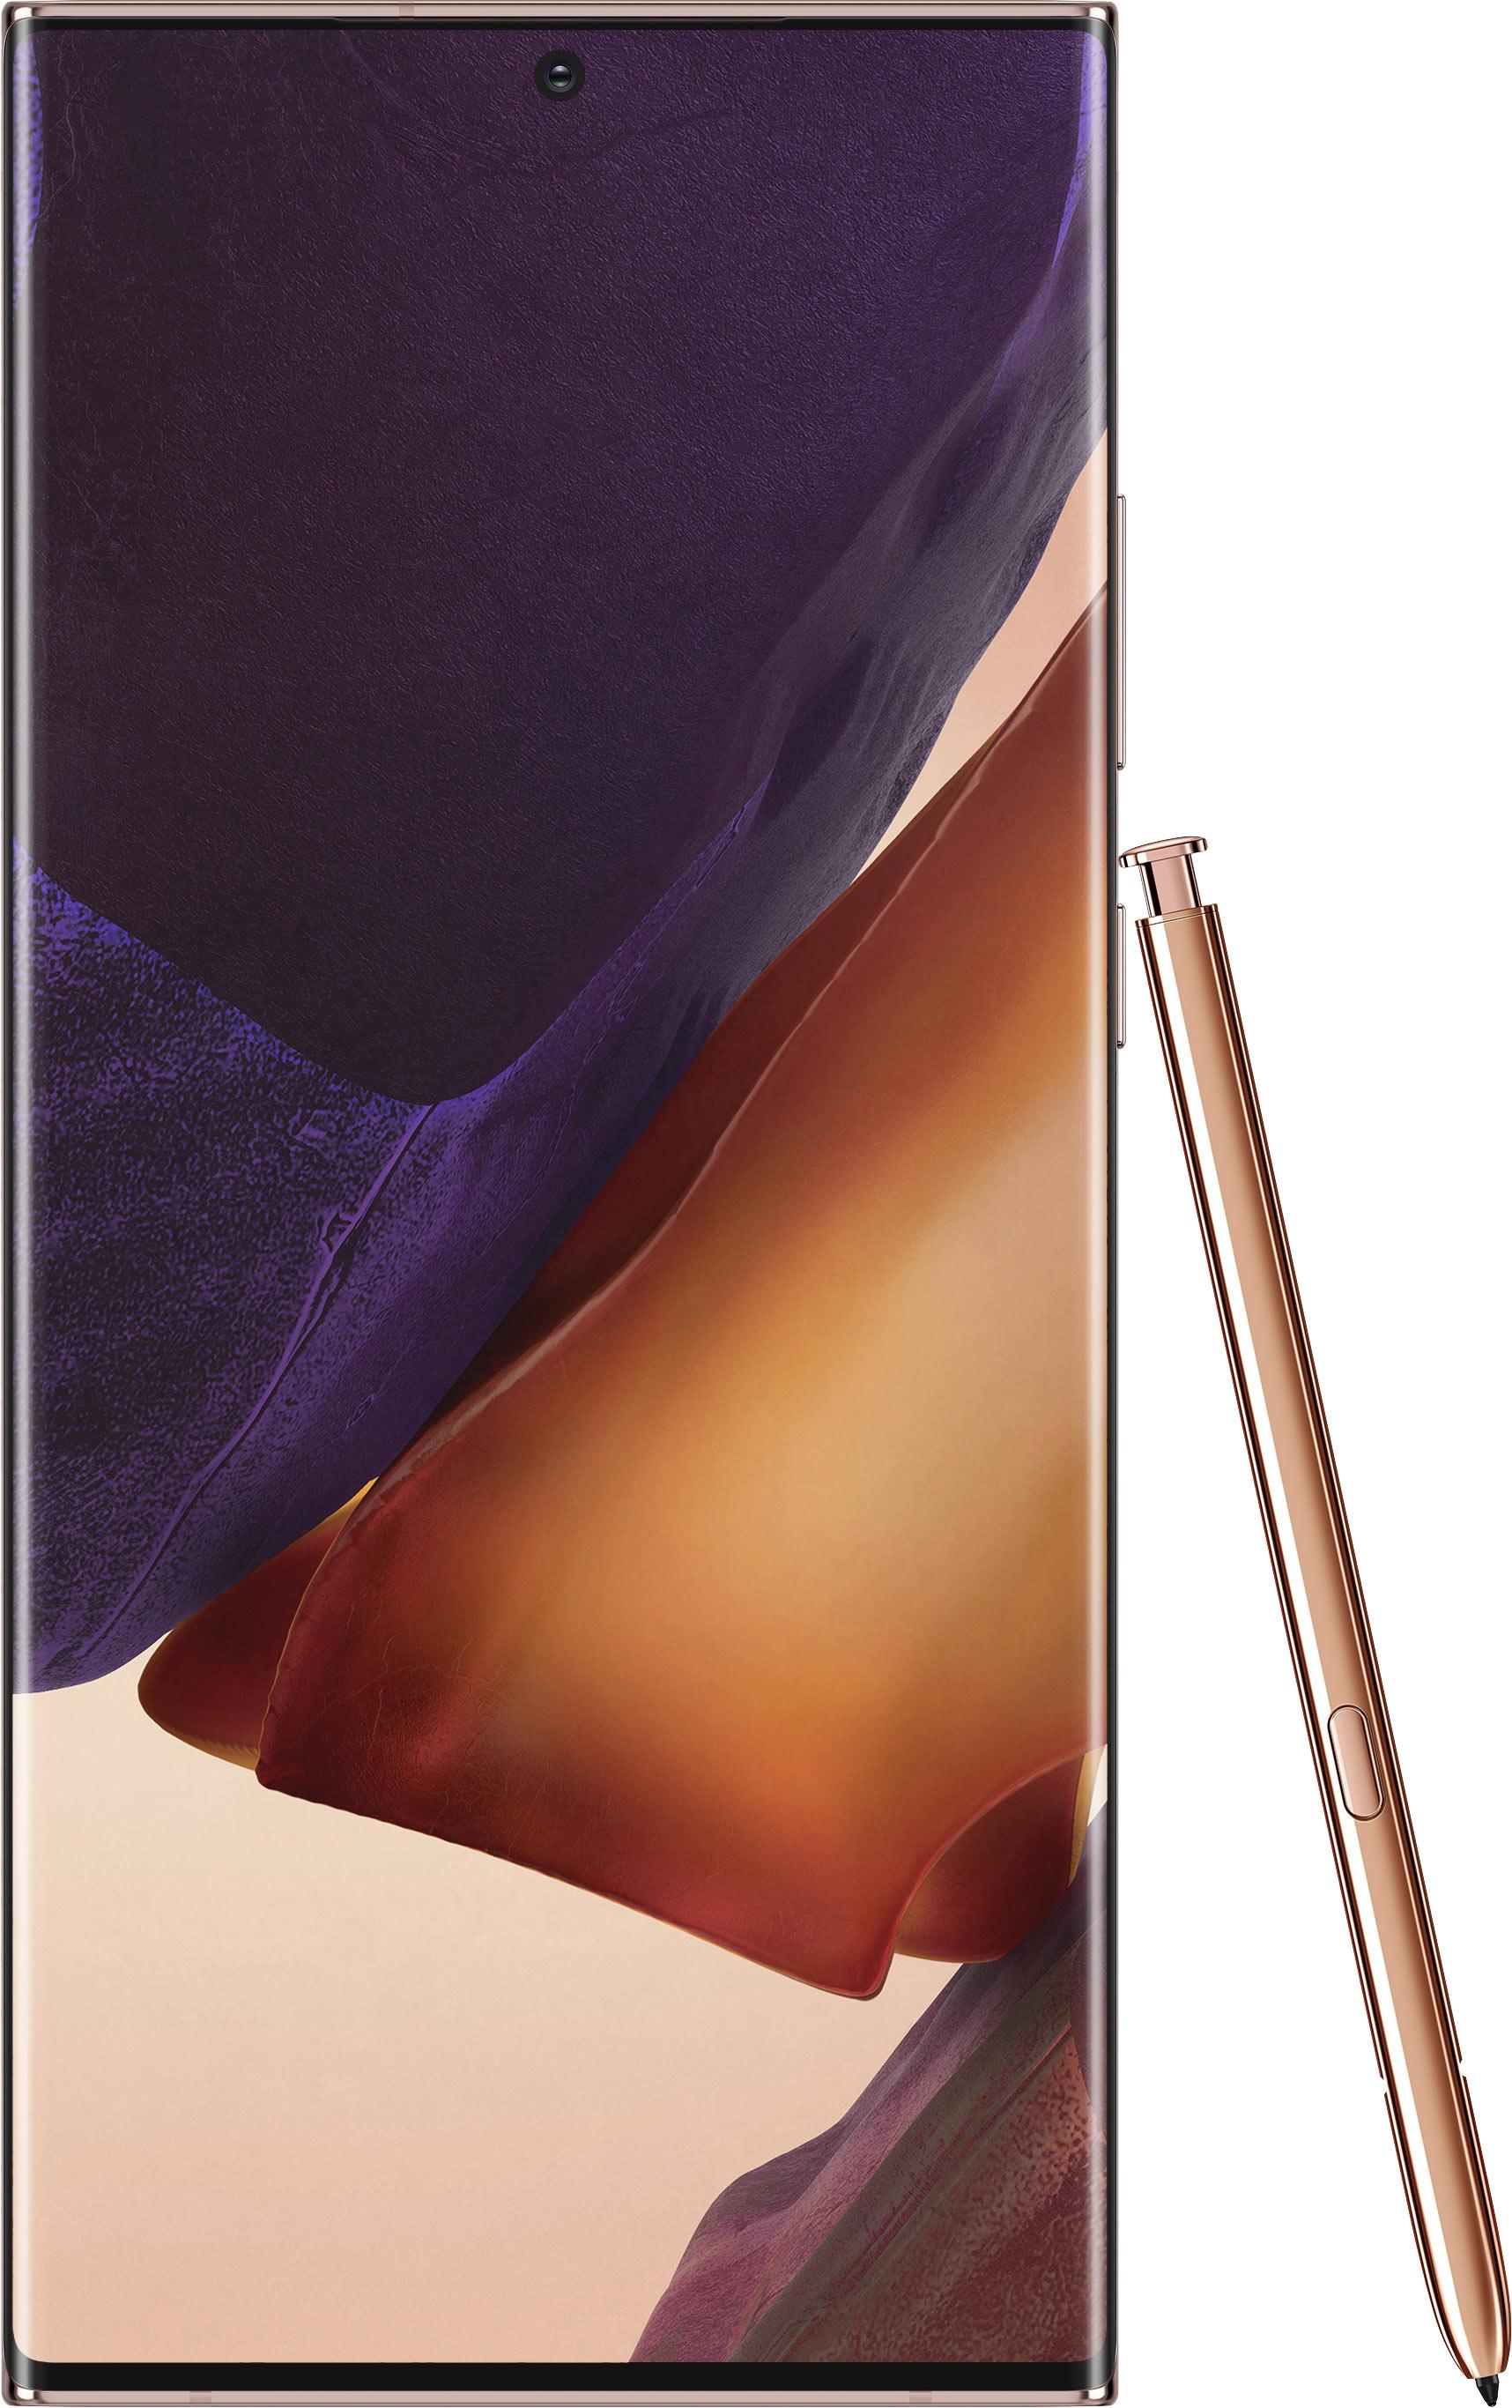 Смартфон Samsung Galaxy Note 20 Ultra 8/256GB Bronze (SM-N985F/DS) Galaxy Note 20 Ultra Bronze (SM-N985F/DS)